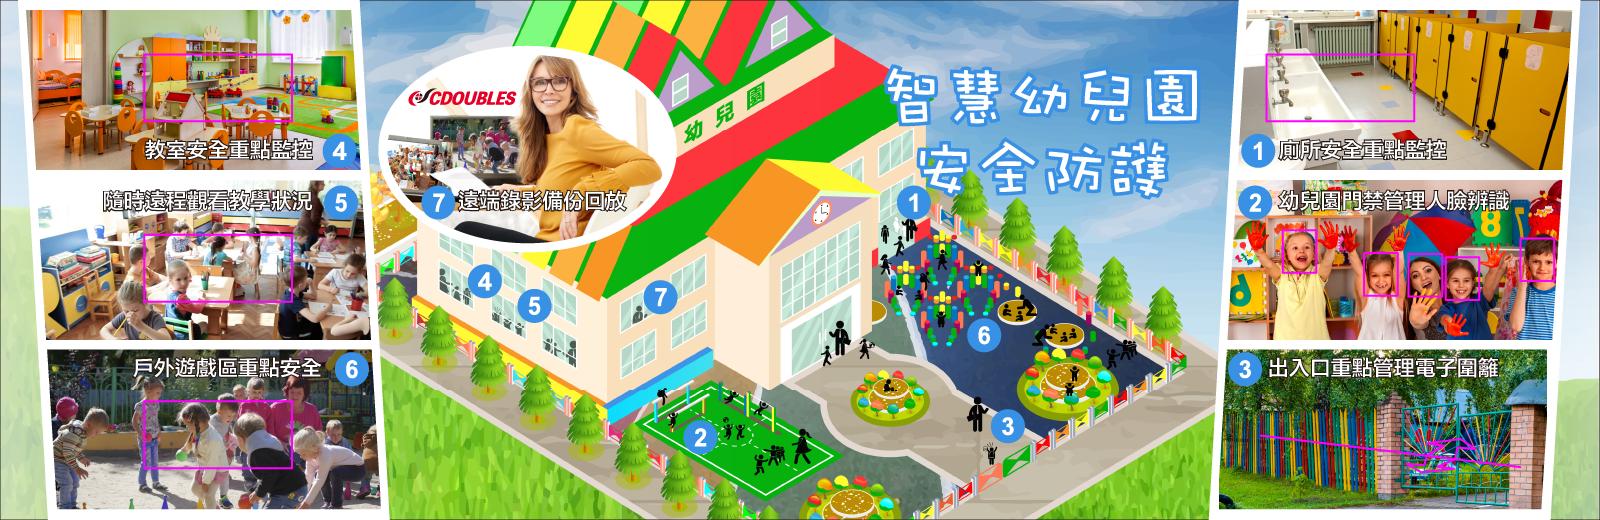 0917智慧幼兒園安全防護banner.png